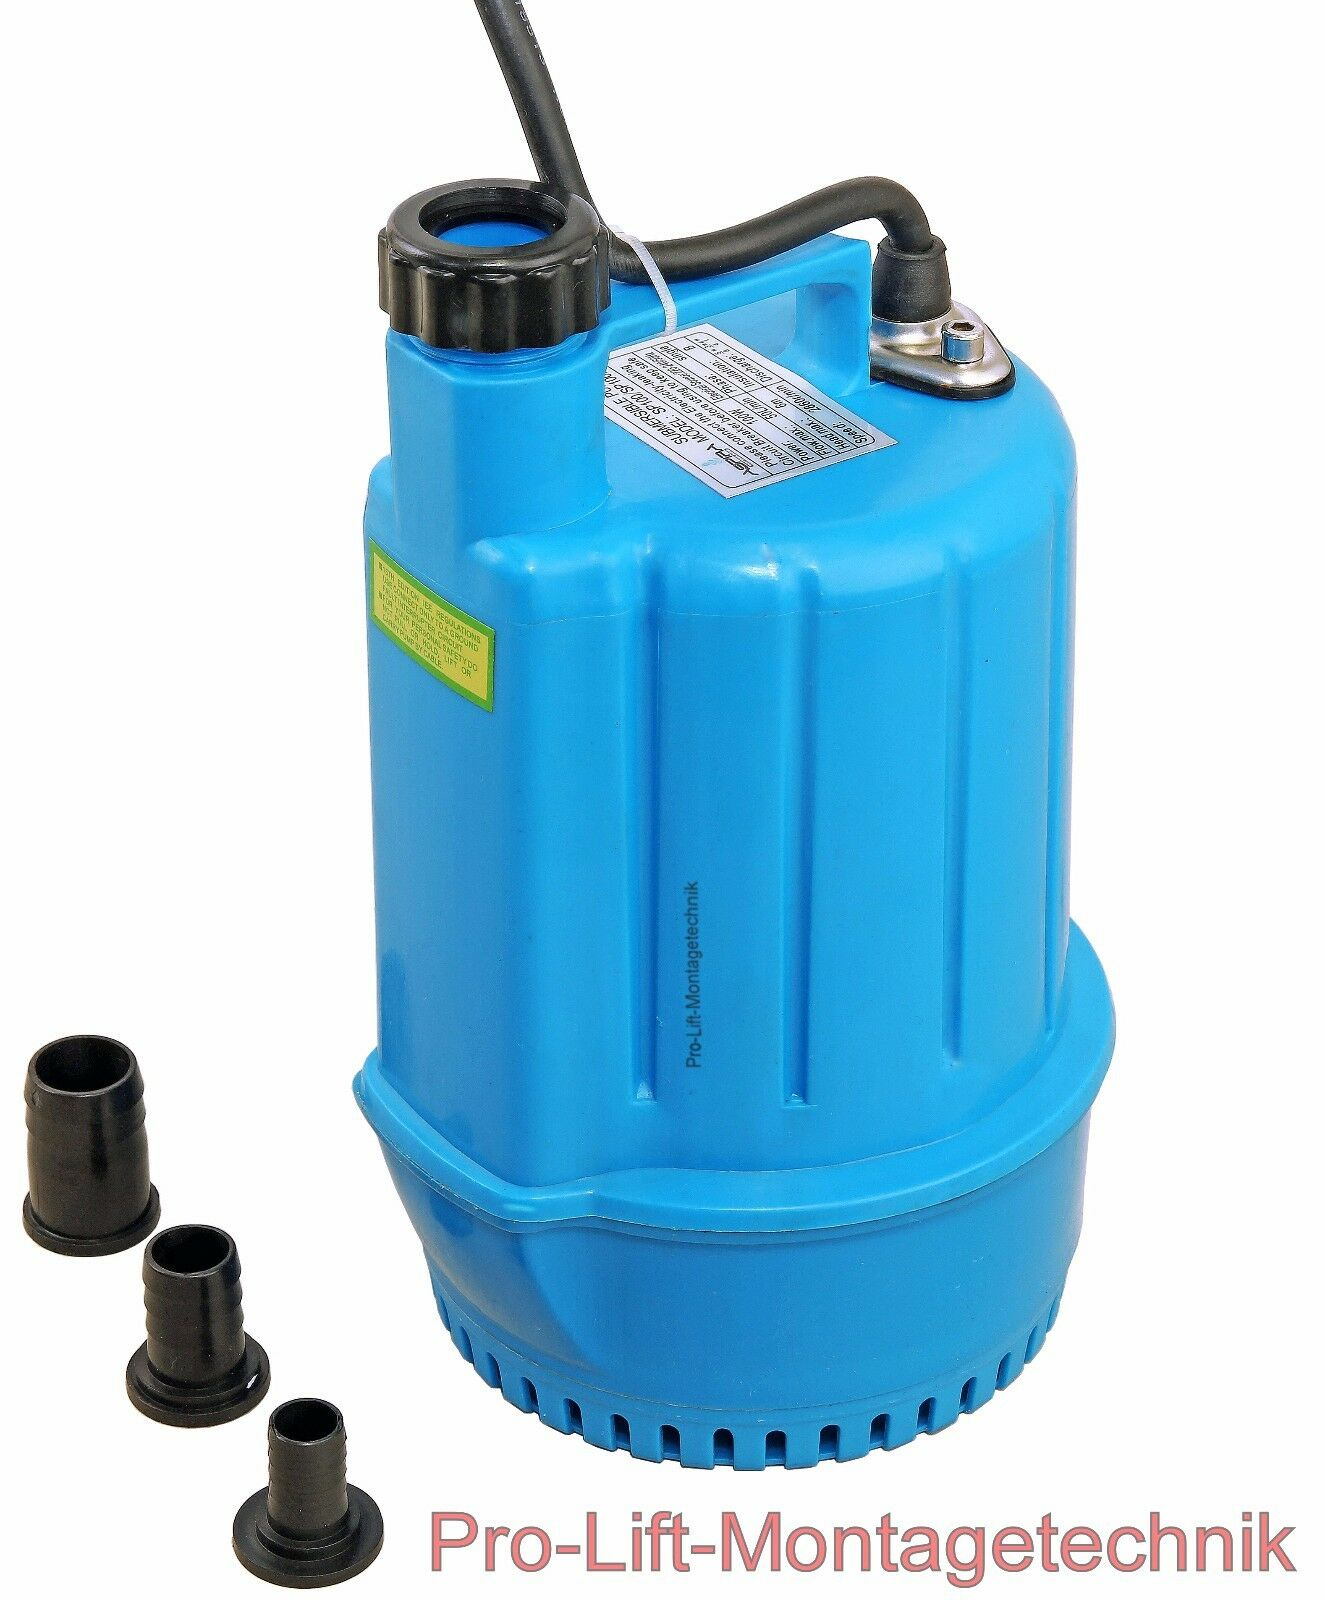 Sumergible 230v 50l min flachsaugerpumpe bomba bomba de presión barril azul sp100j 01959